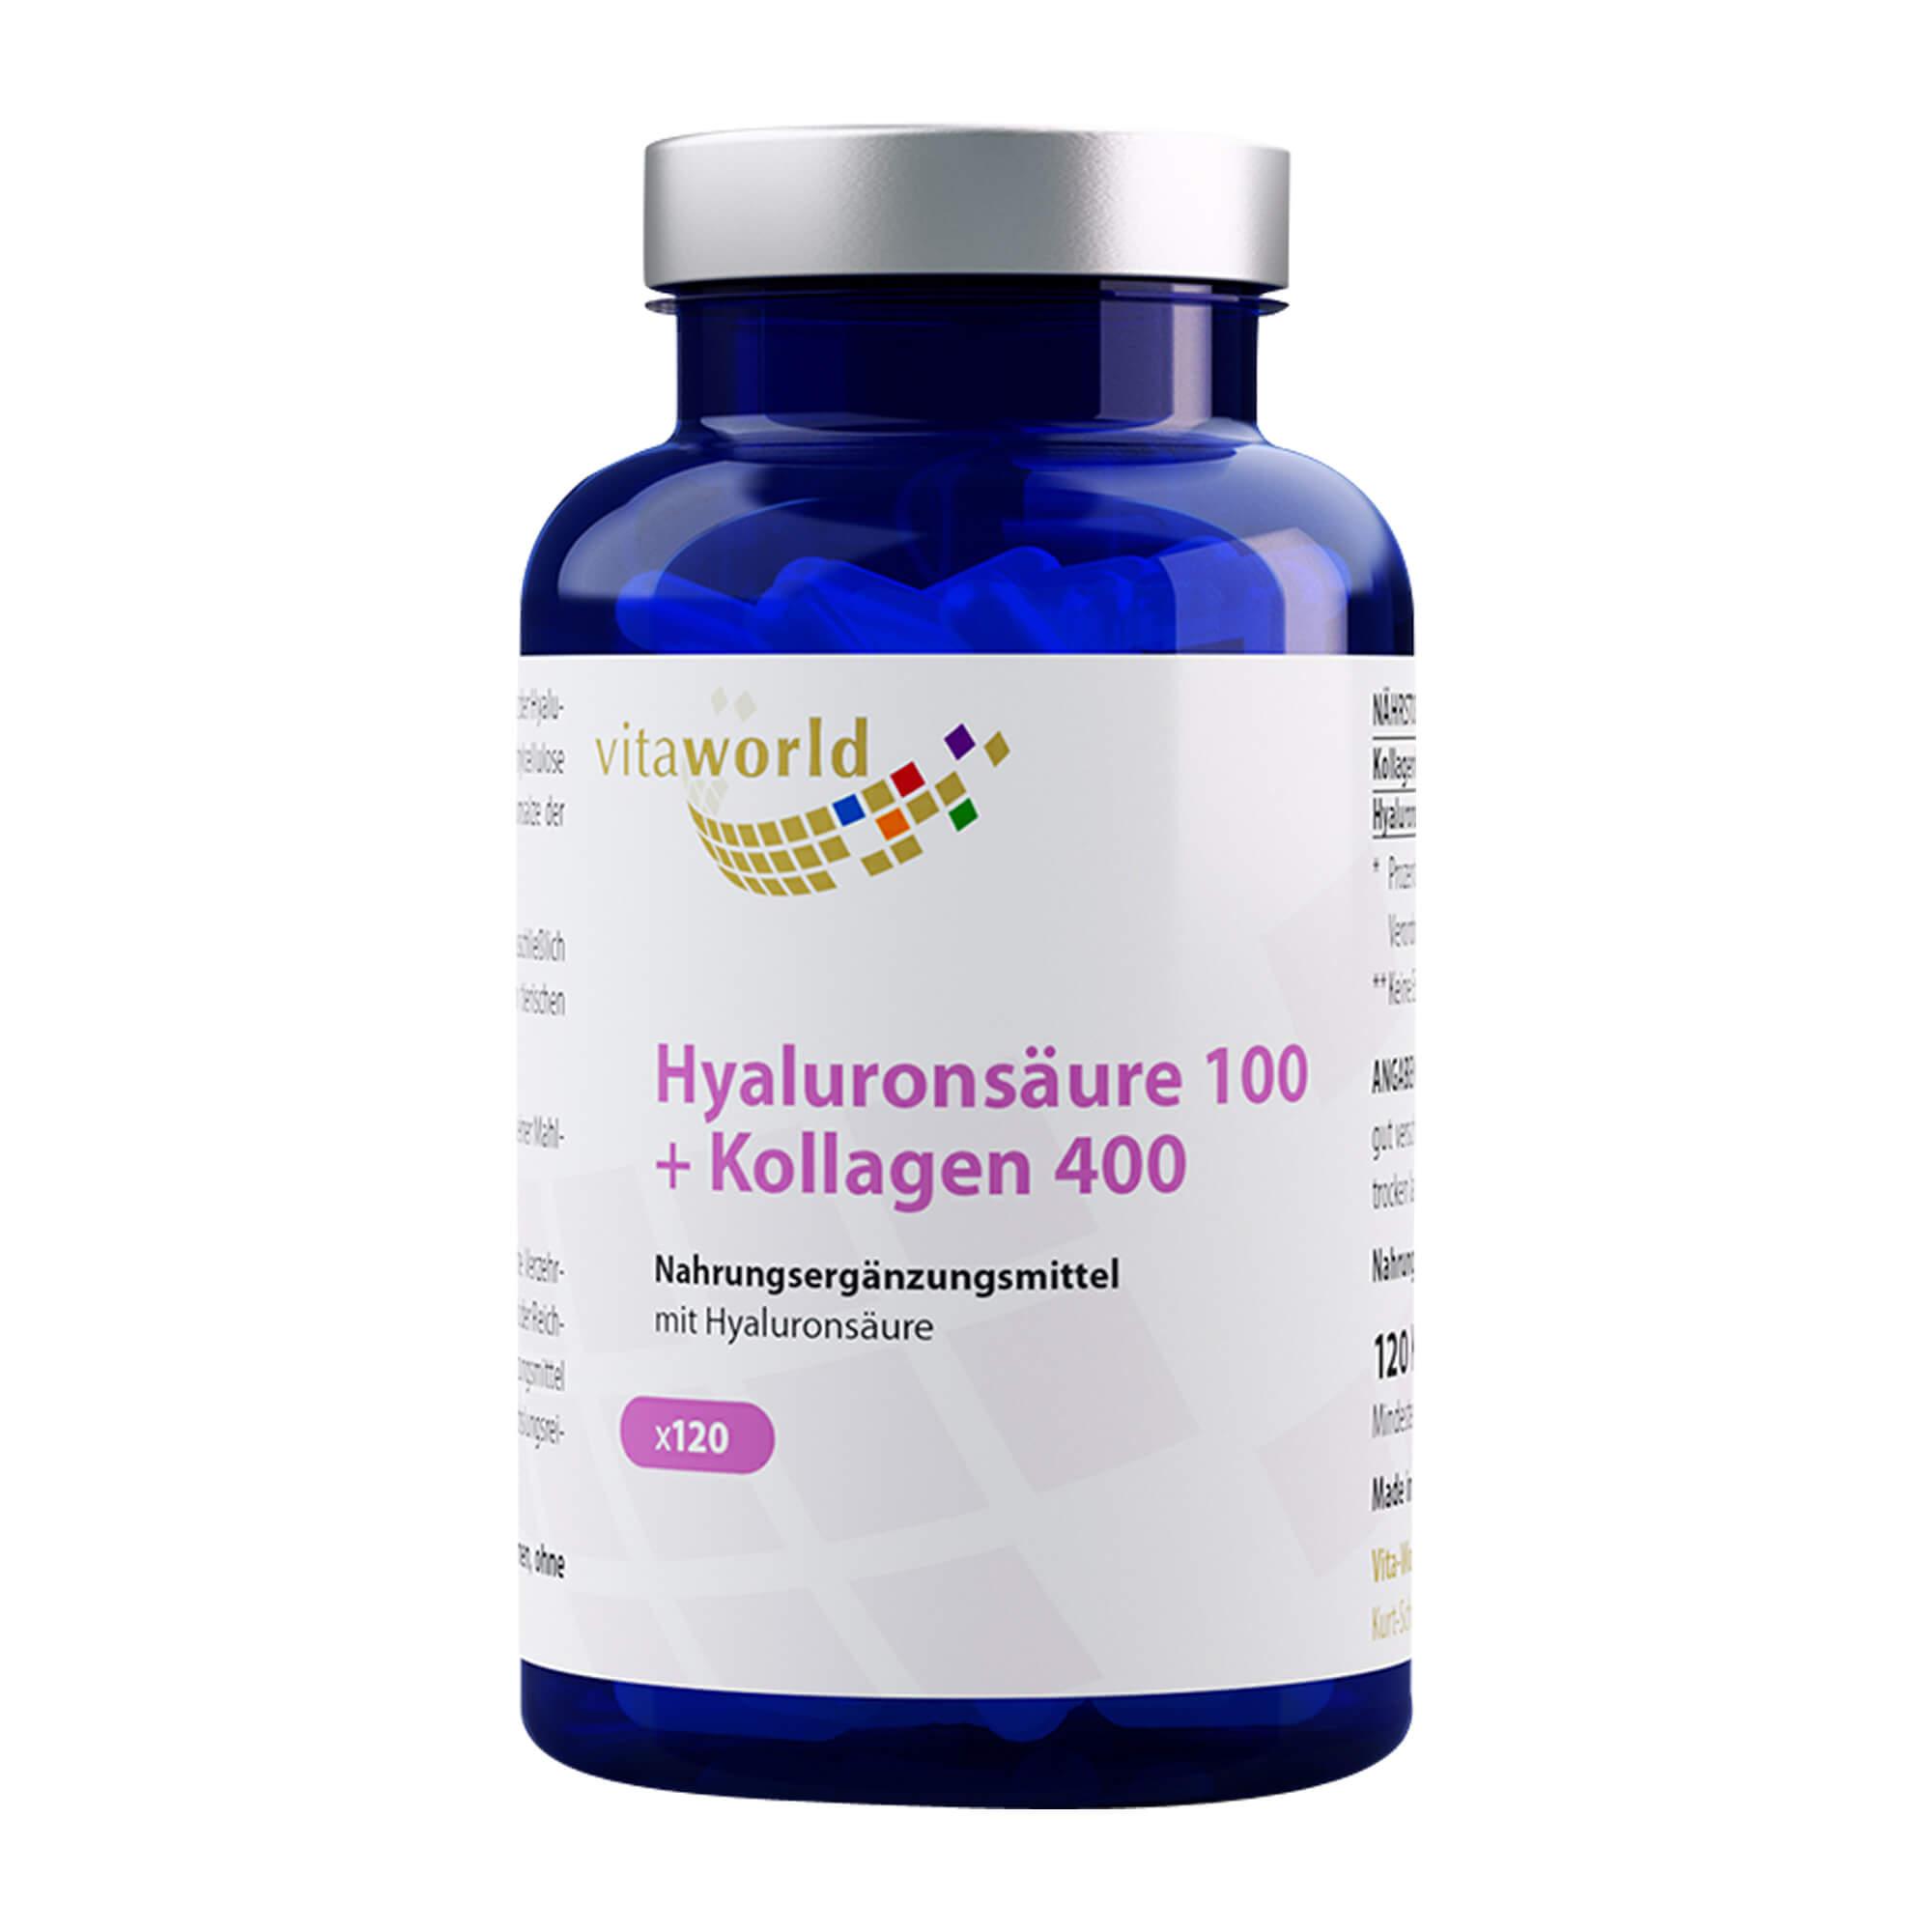 HYALURONSAEURE 100+KOLL400